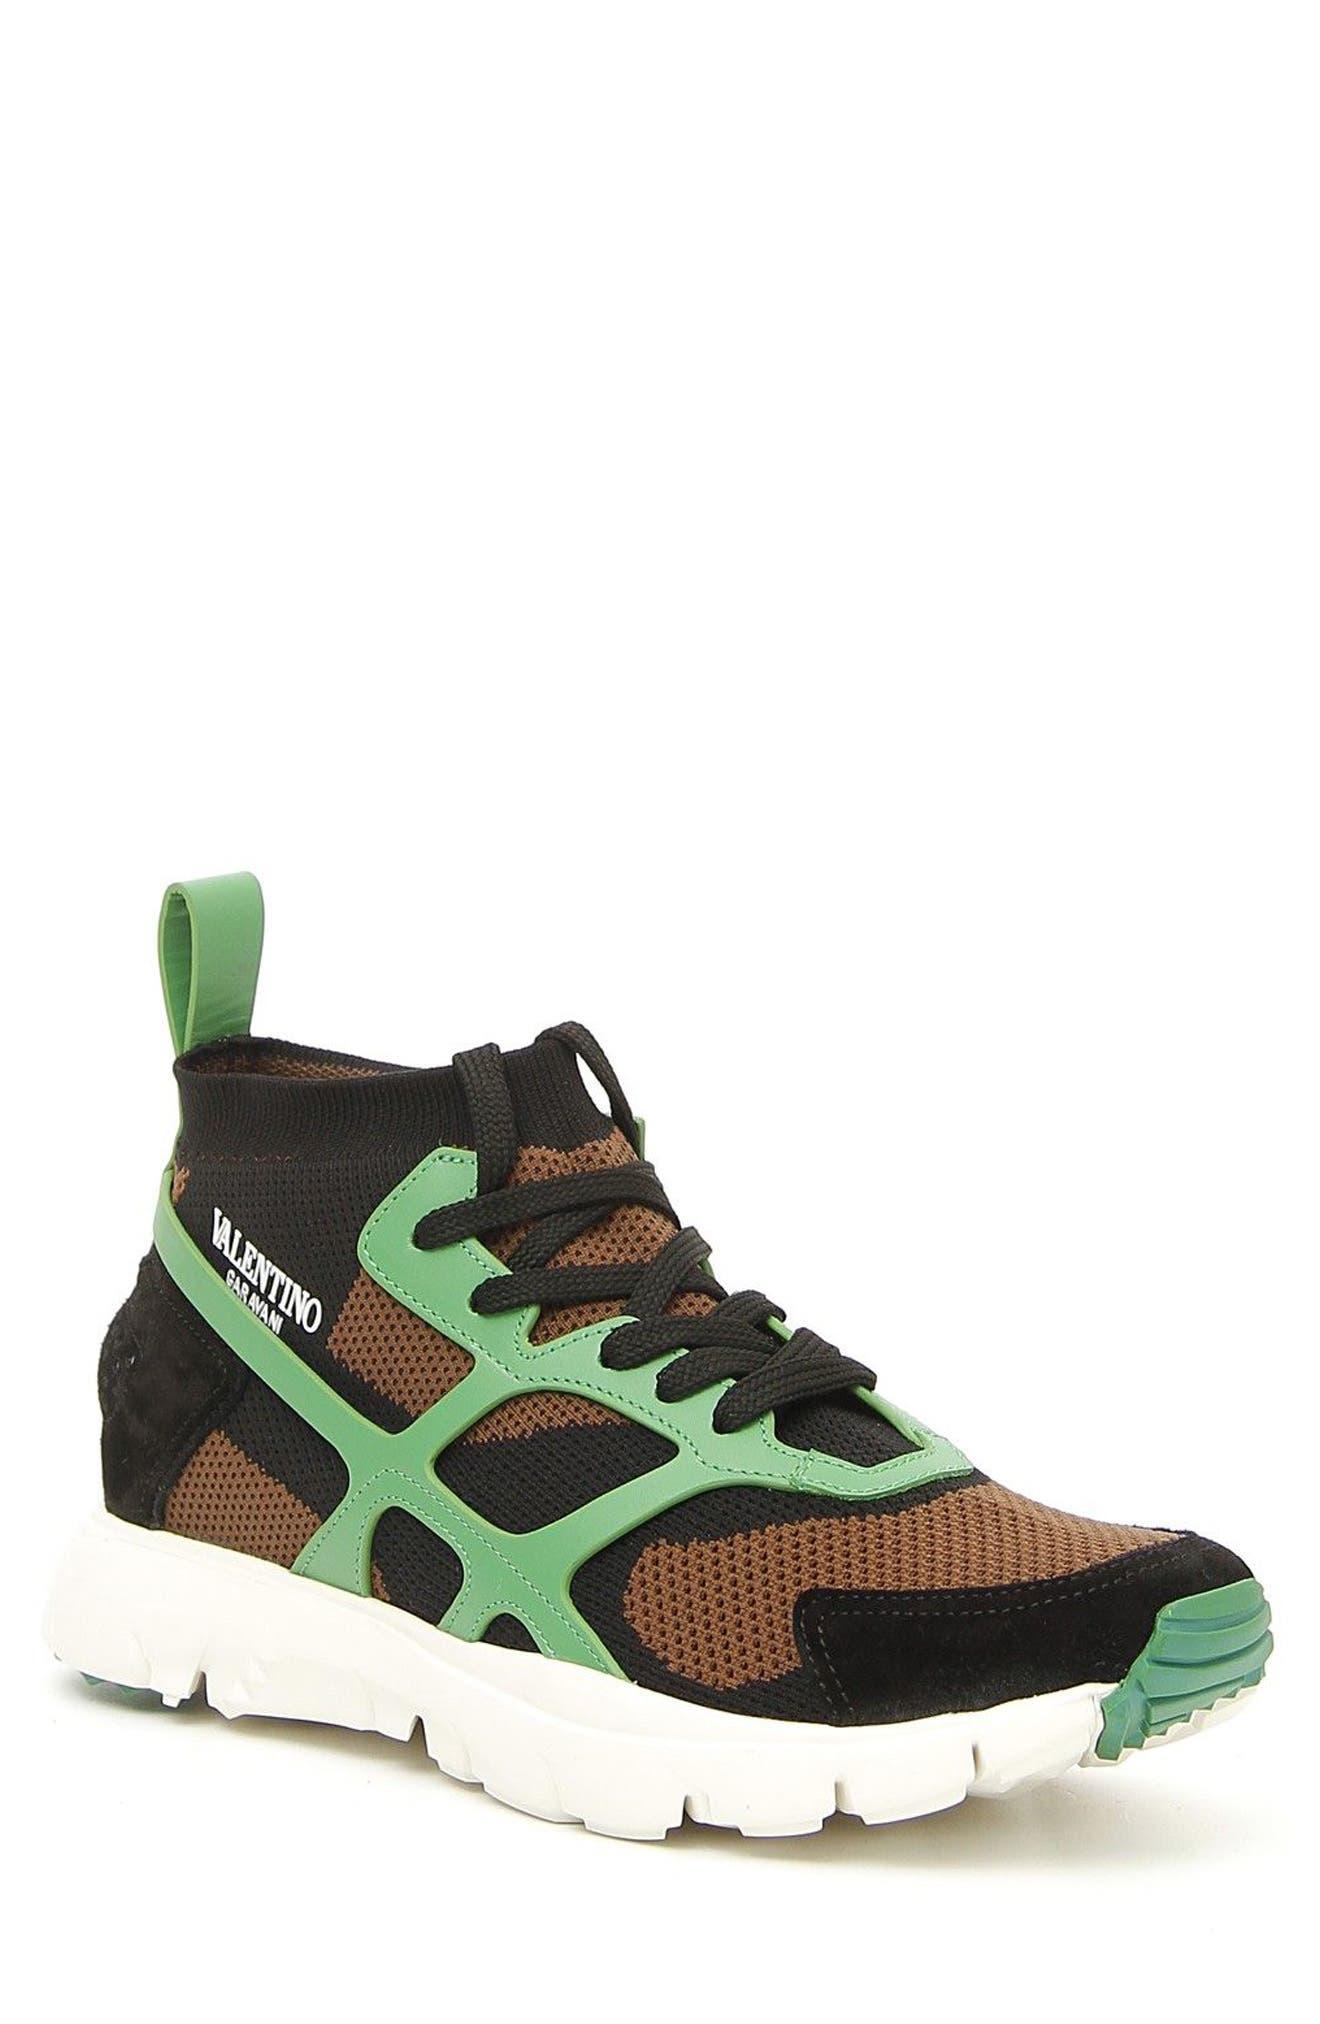 Sound High Sneaker,                             Main thumbnail 2, color,